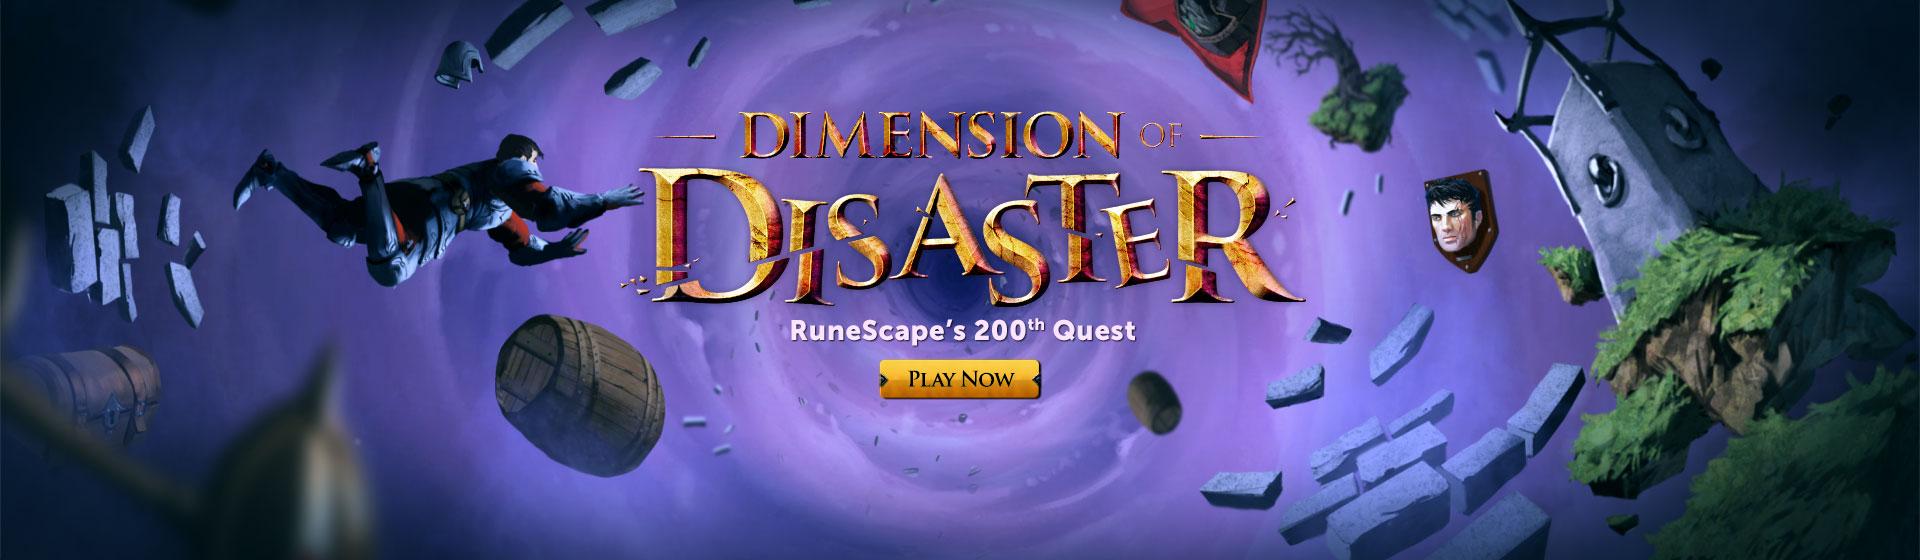 Dimension of Disaster banner.jpg